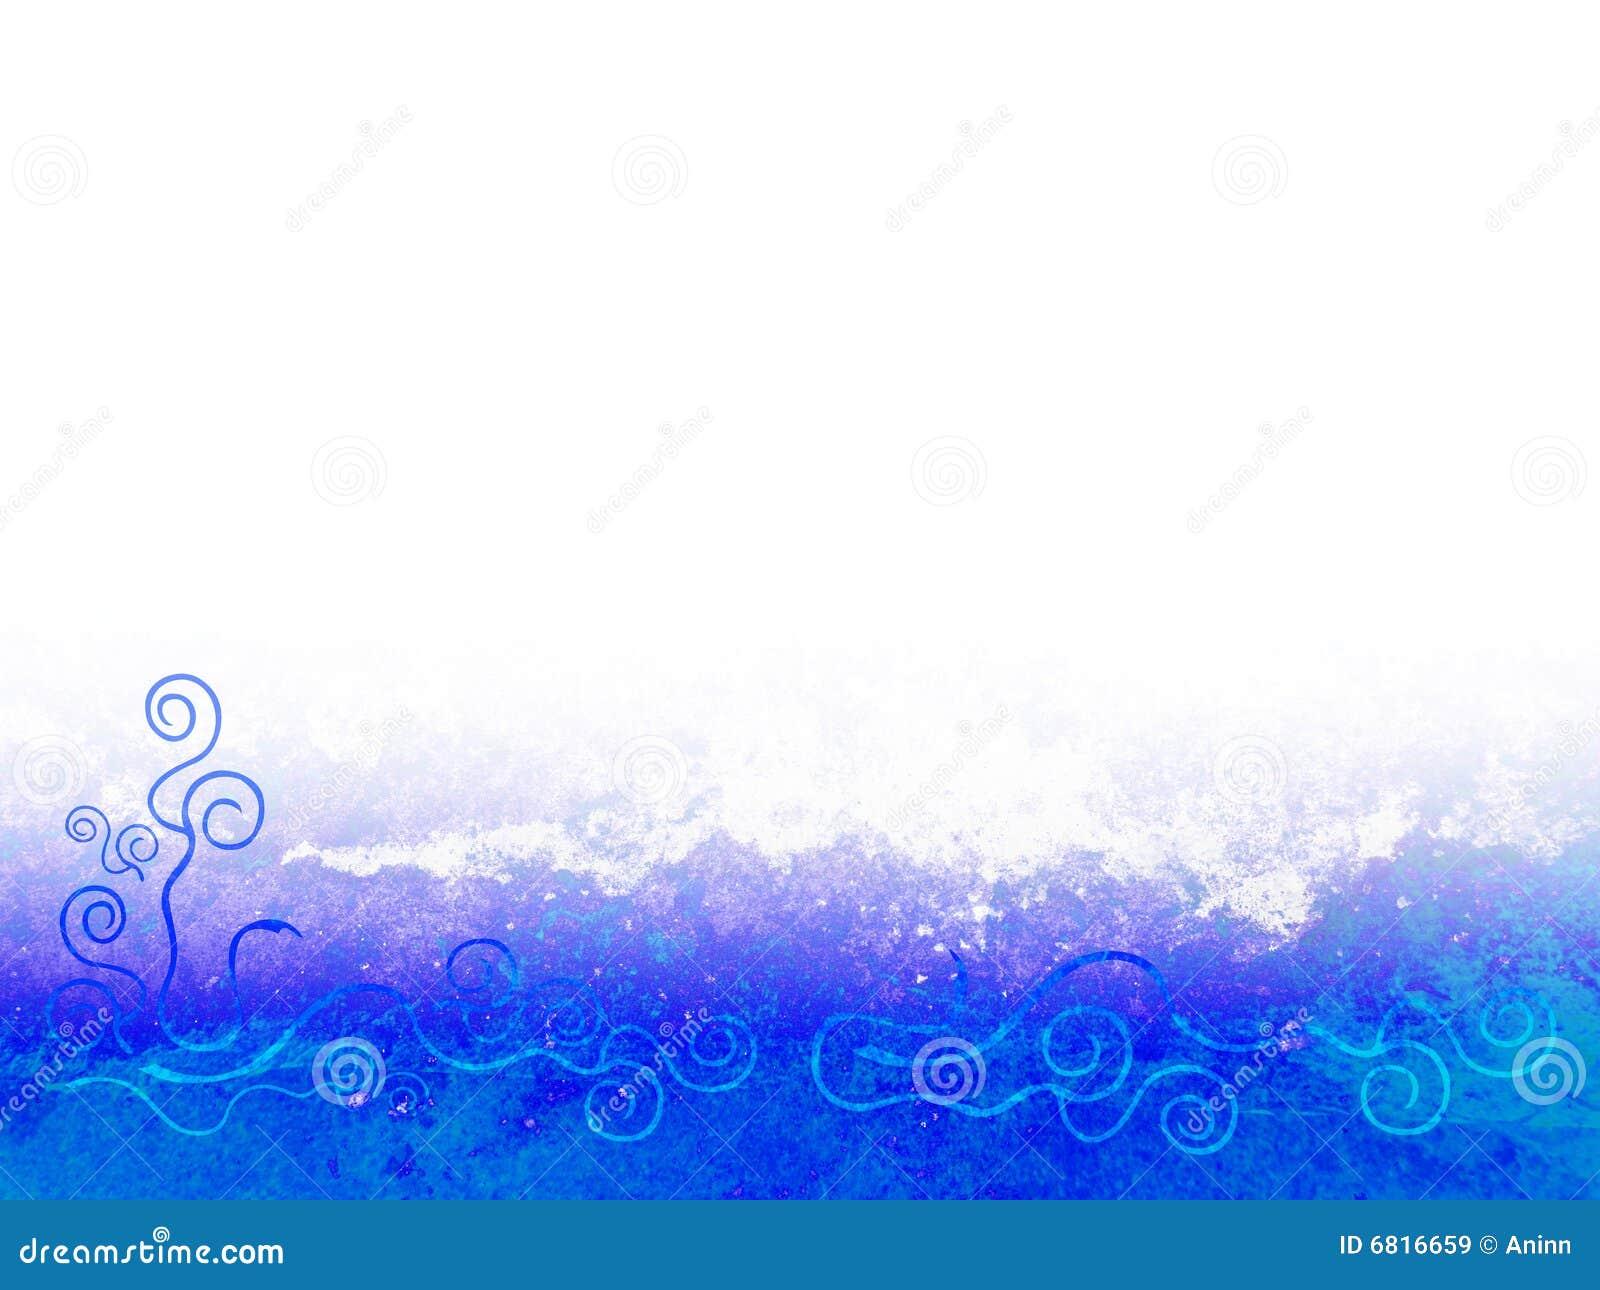 Blue Border Royalty Free Stock Images - Image: 6816659